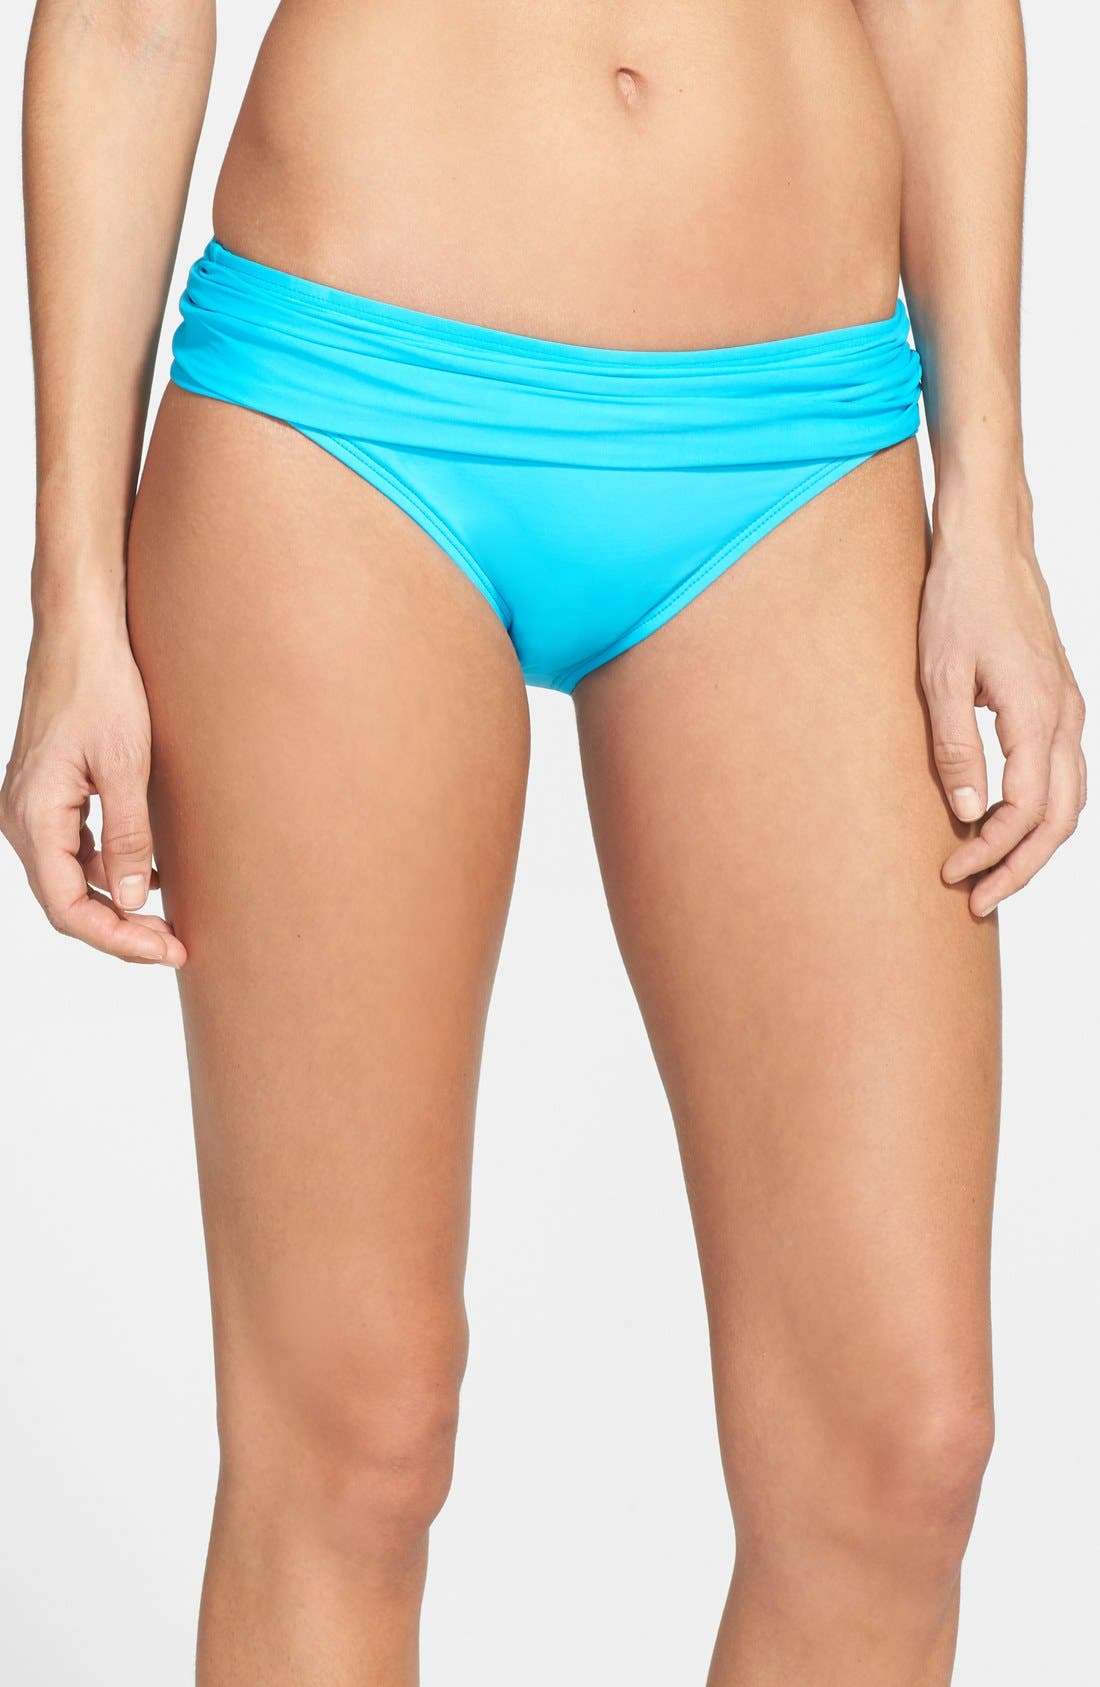 Alternate Image 1 Selected - La Blanca 'Island' Shirred Hipster Bikini Bottoms